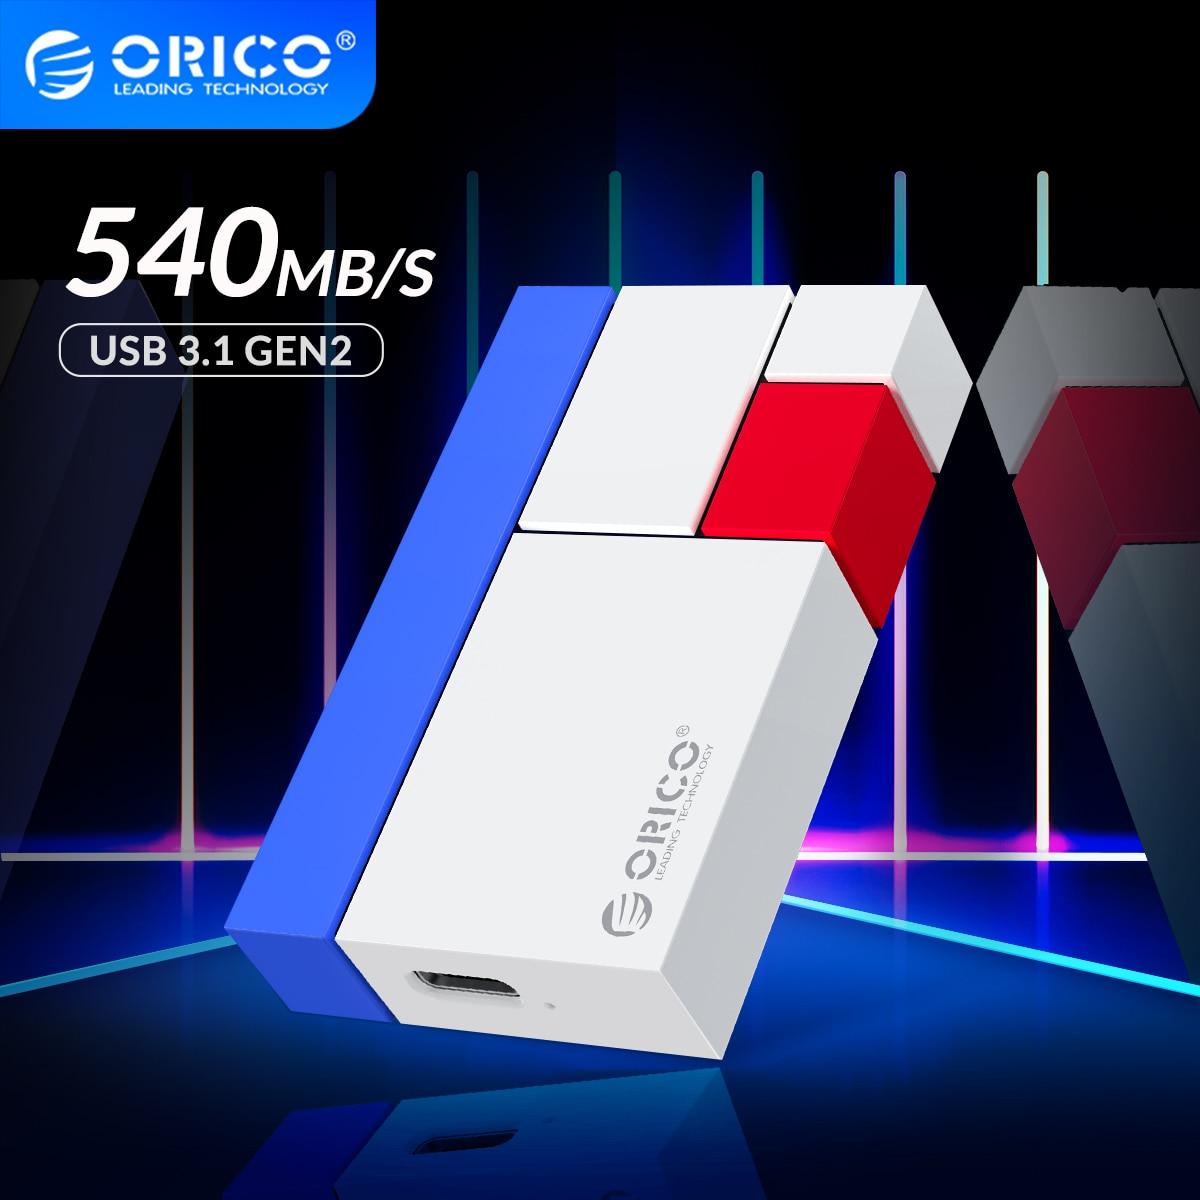 ORICO Chroma CN300 discos duros externos 1TB 500GB 250GB M.2 Mini SSD portátil USBC3.1 540 M/S colorido disco duro externo